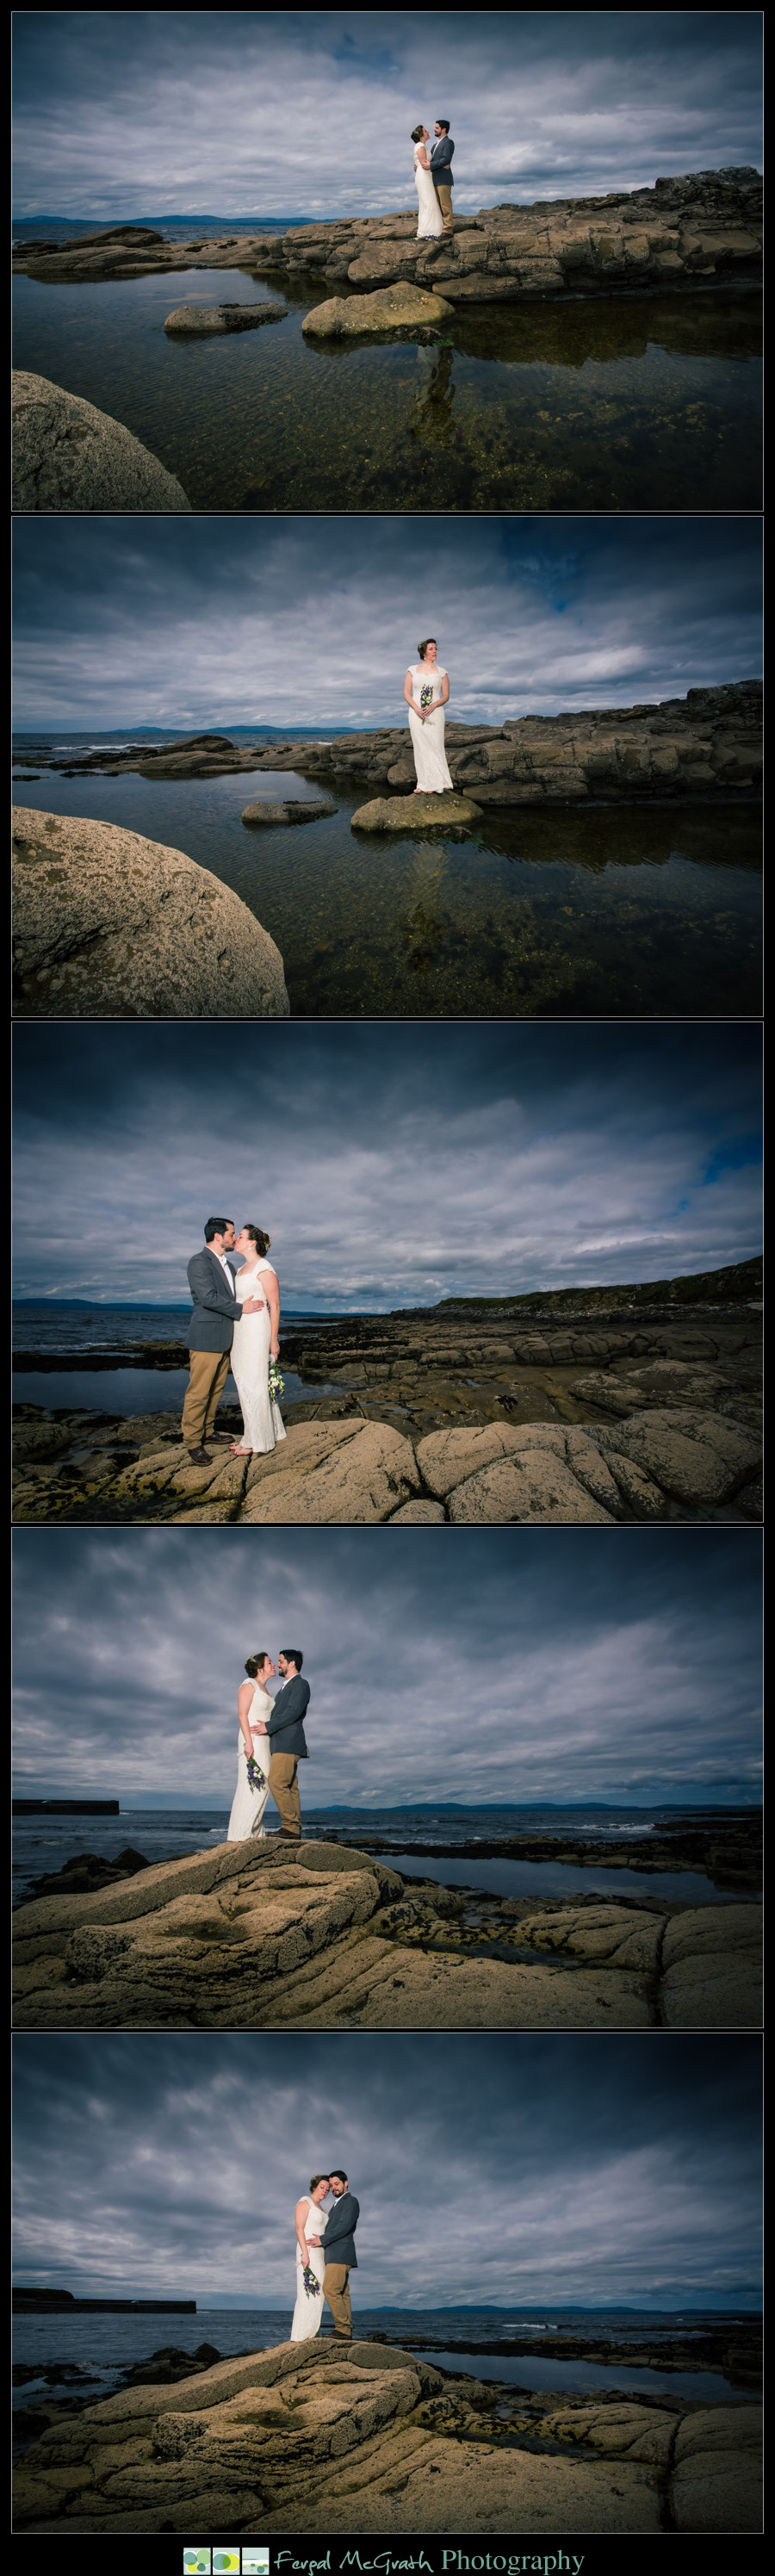 Donegal Wedding Photography wedding photos taken at creevy pier near ballyshannon